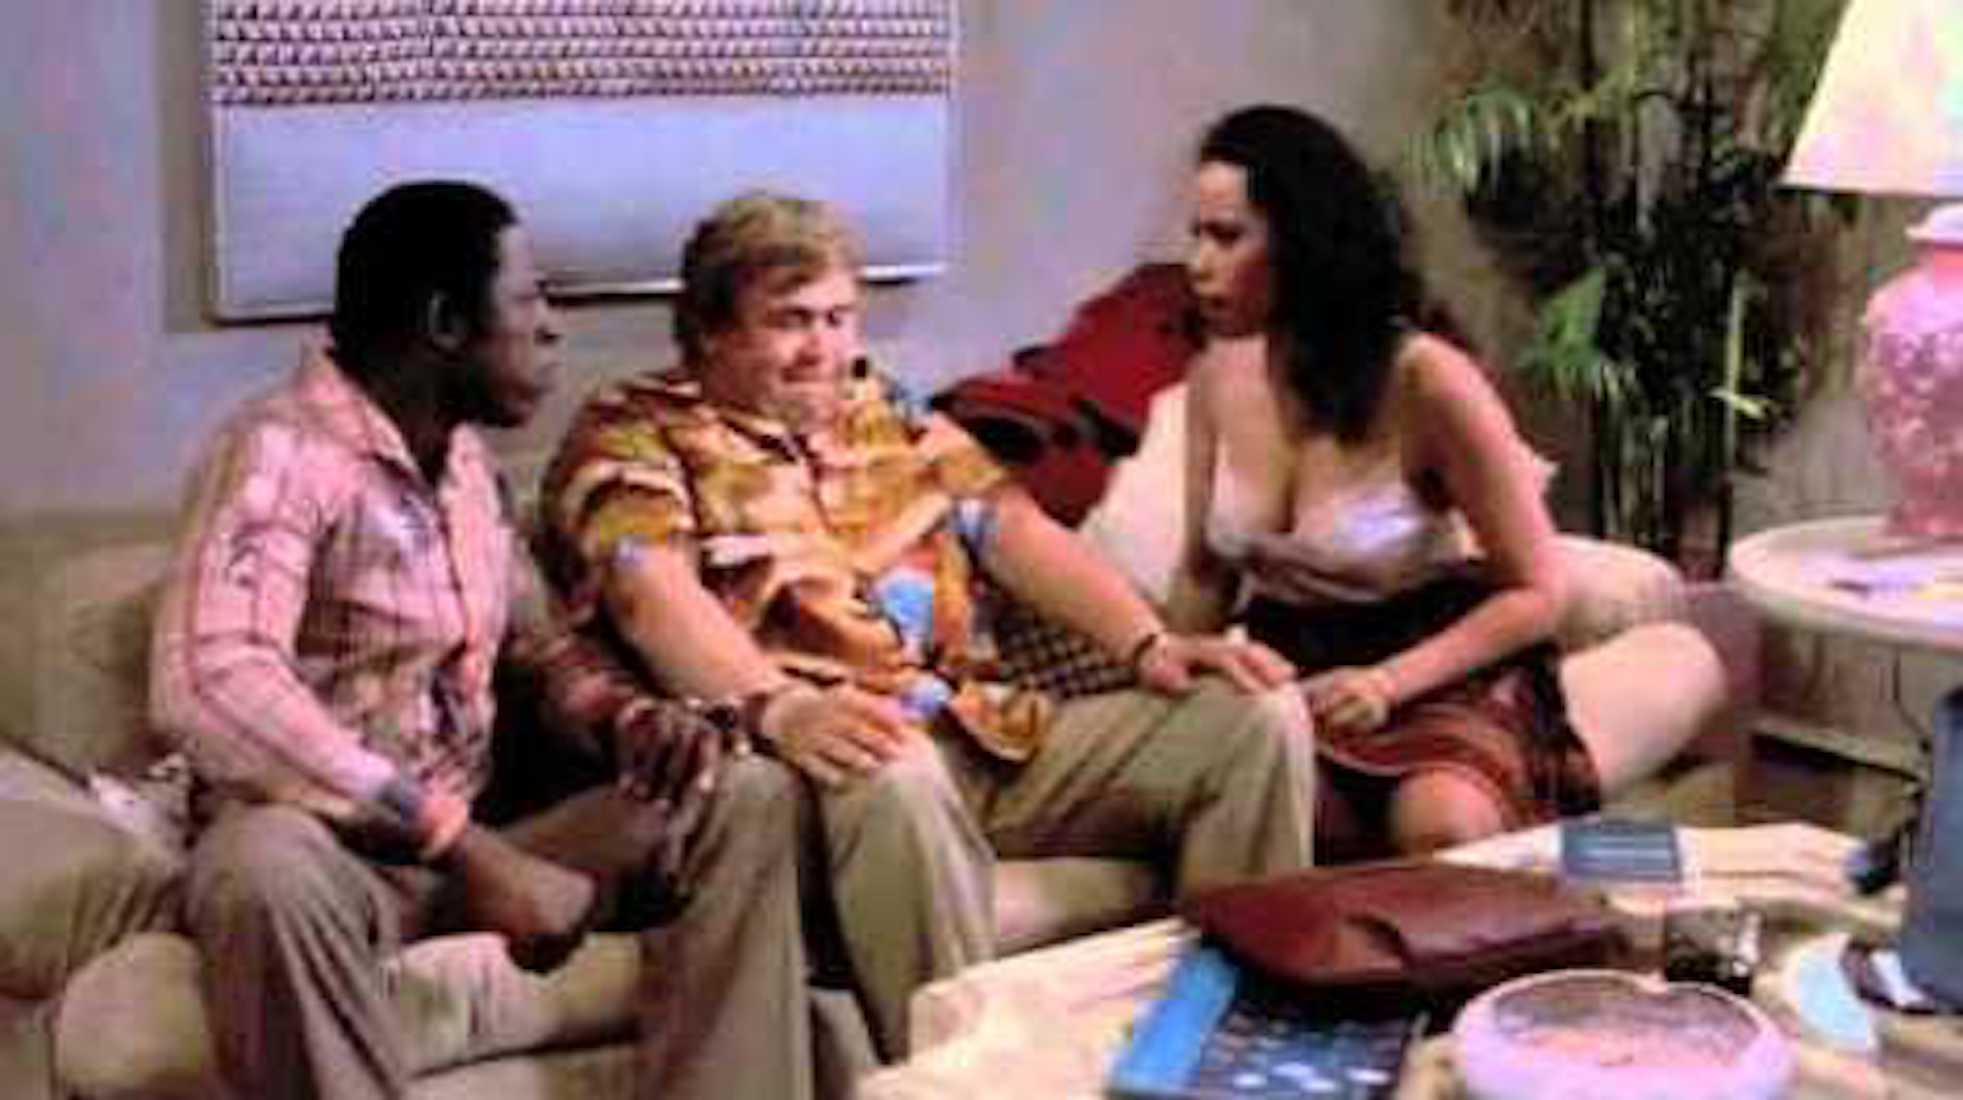 Still of Gloria Gifford, John Candy and Ernie Hudson in Going Berserk